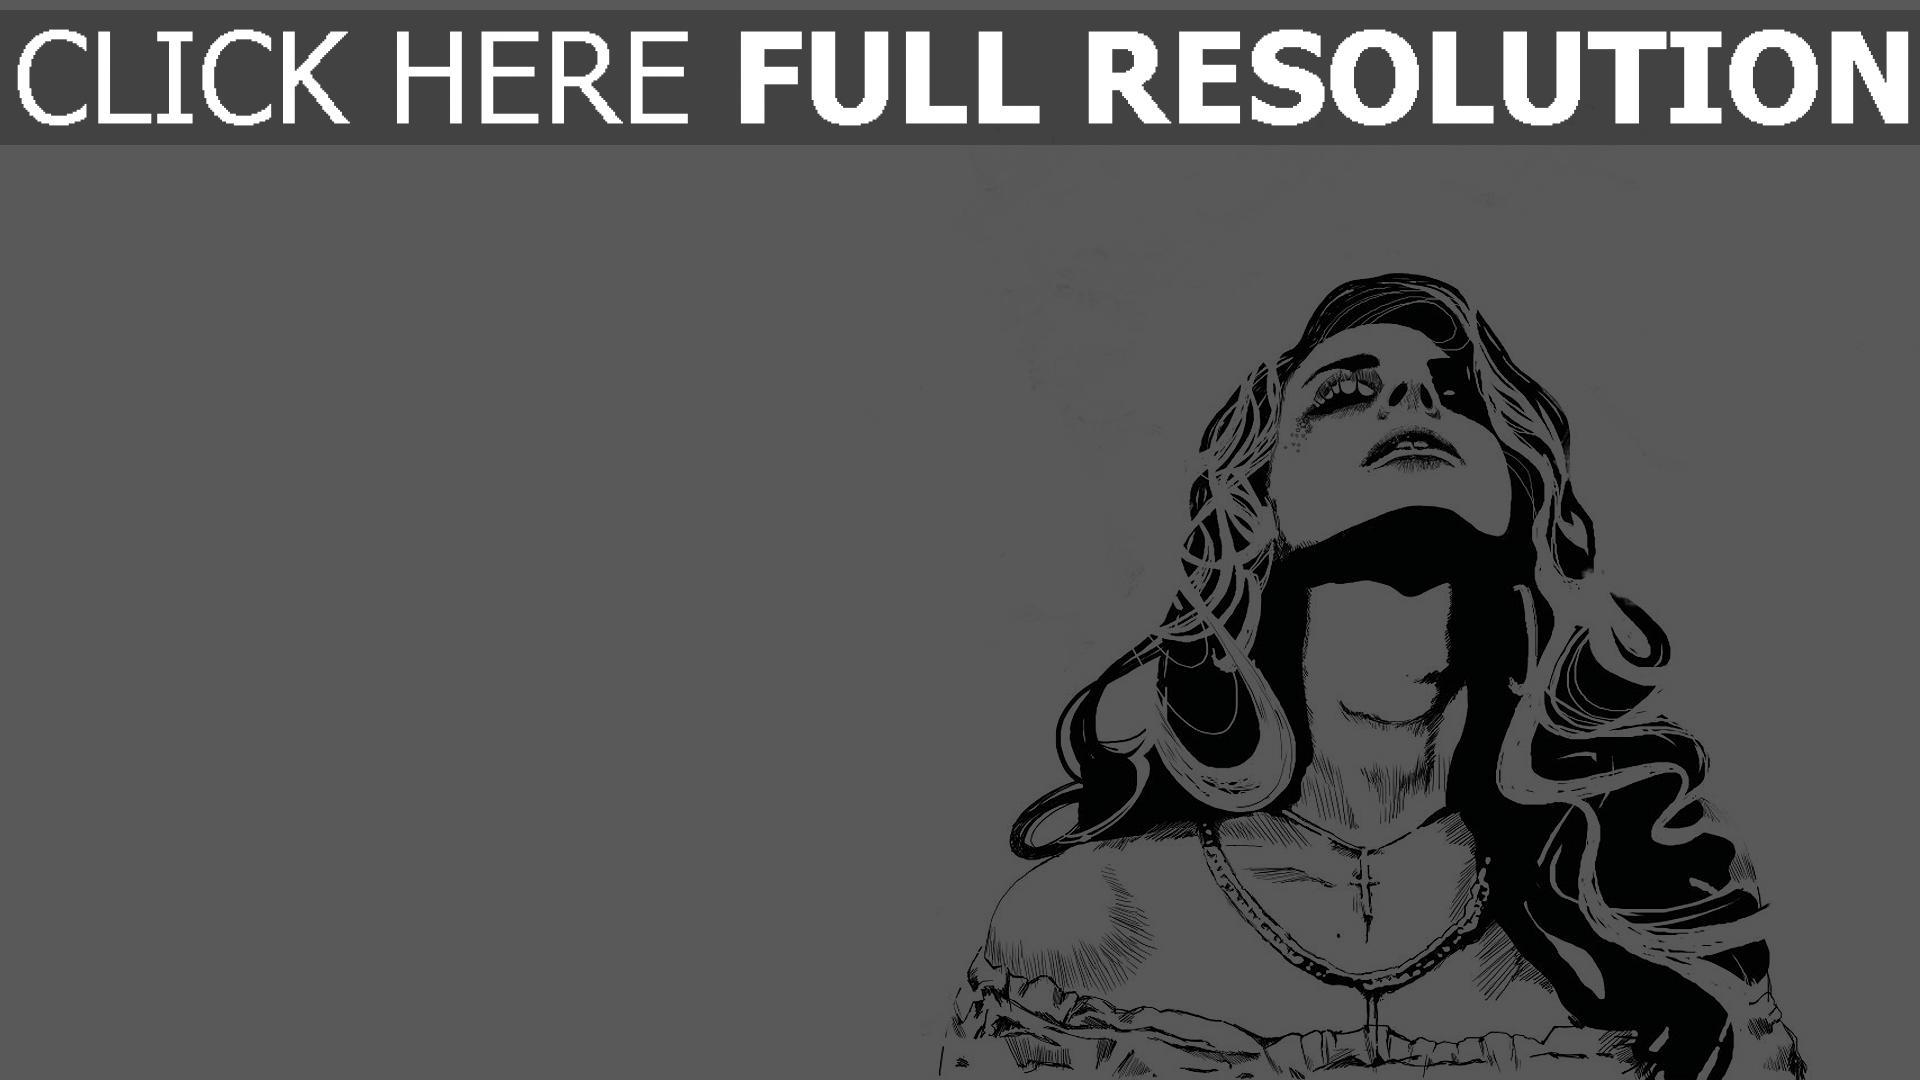 t u00e9l u00e9charger 1920x1080 full hd fond d u0026 39  u00e9cran lana del rey graffiti sensuel chanteuse  images et photos